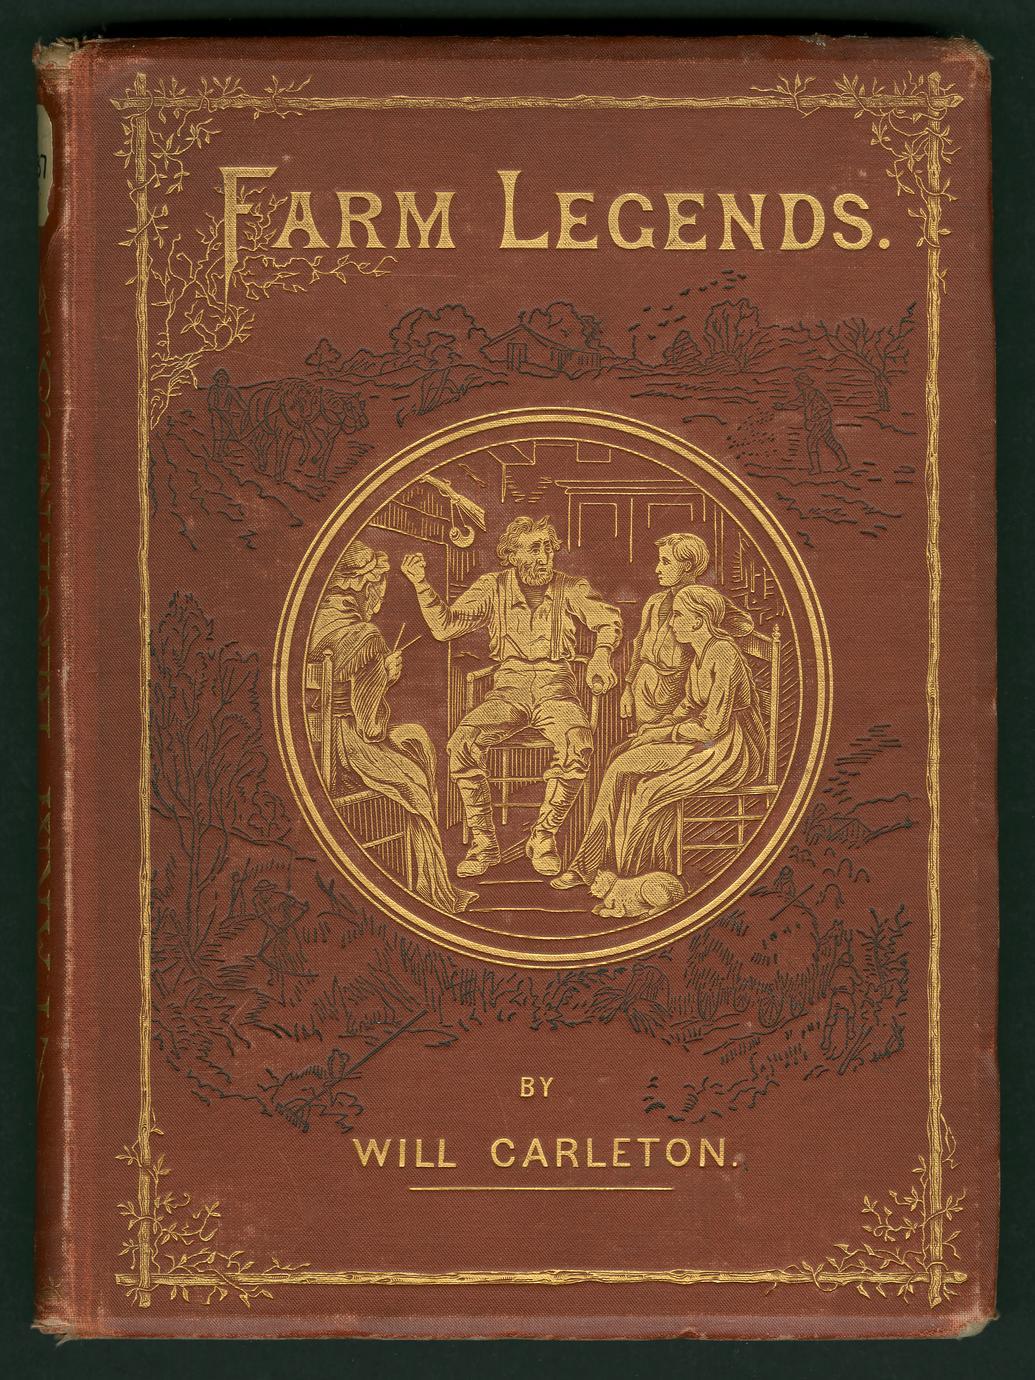 Farm legends (1 of 4)